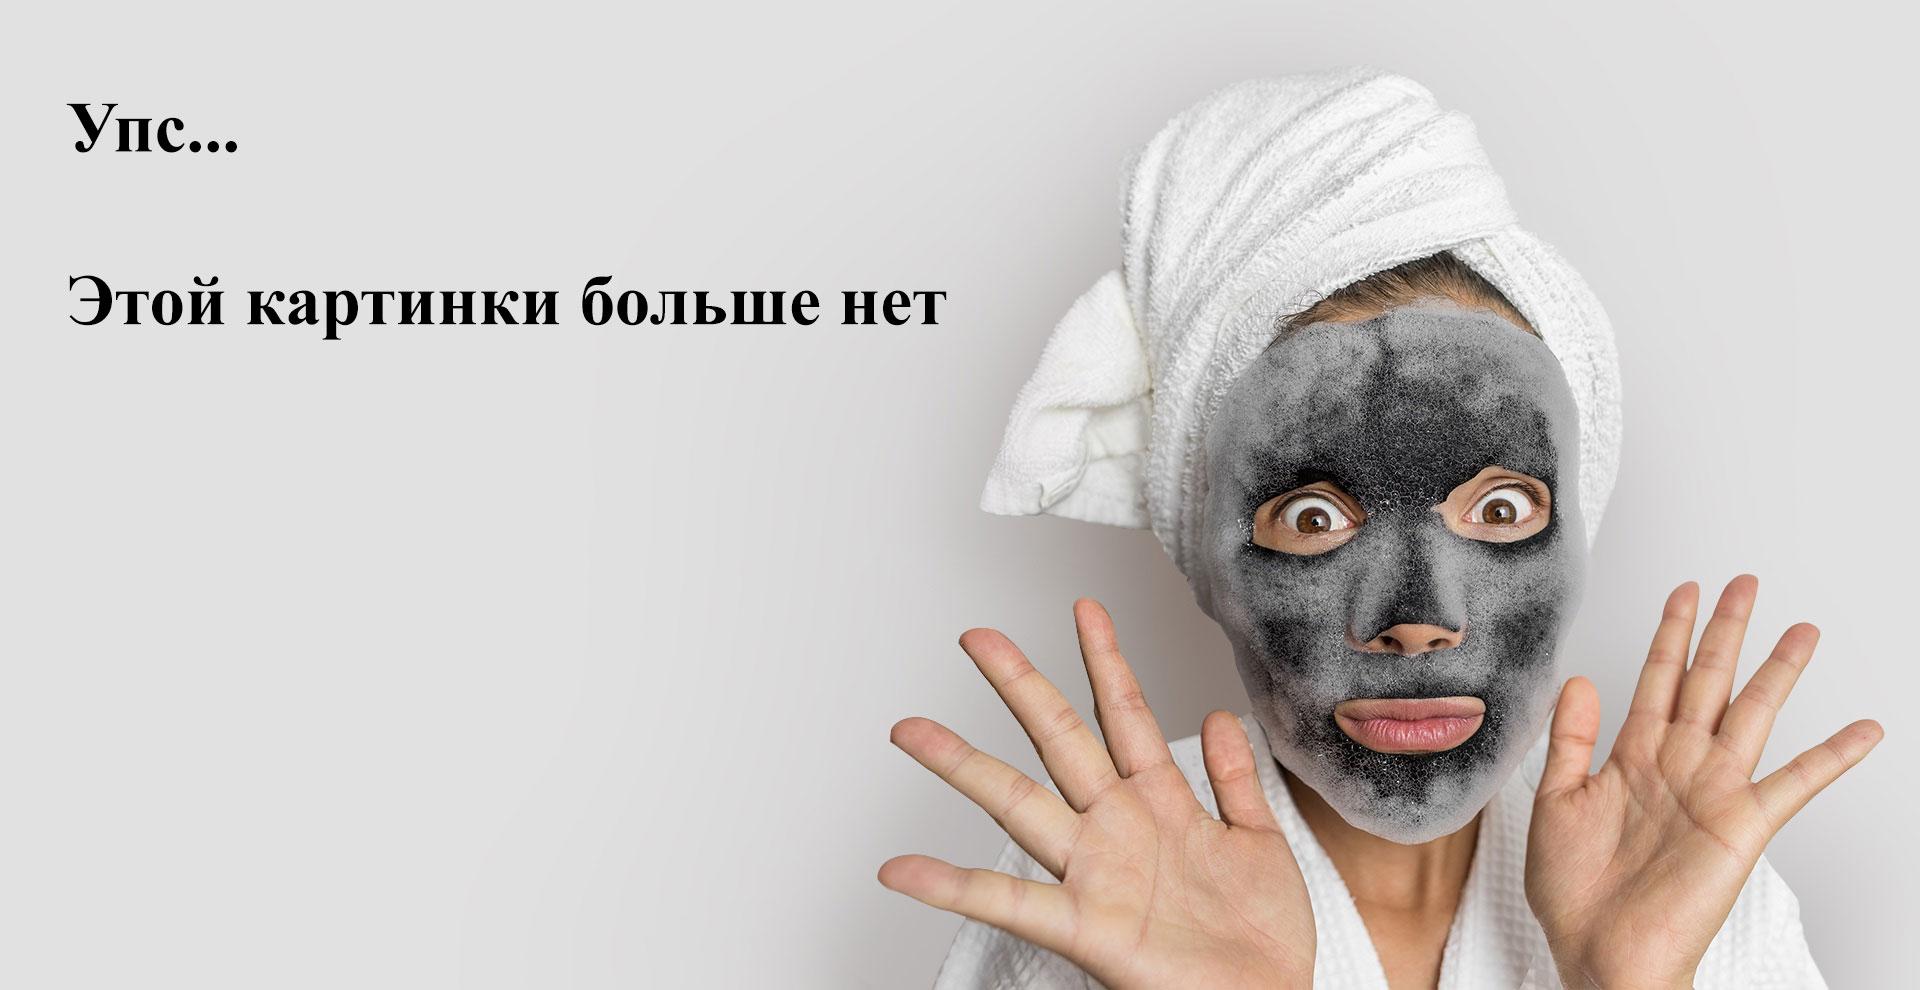 Patrisa Nail, Гель-лак Московская сага №762